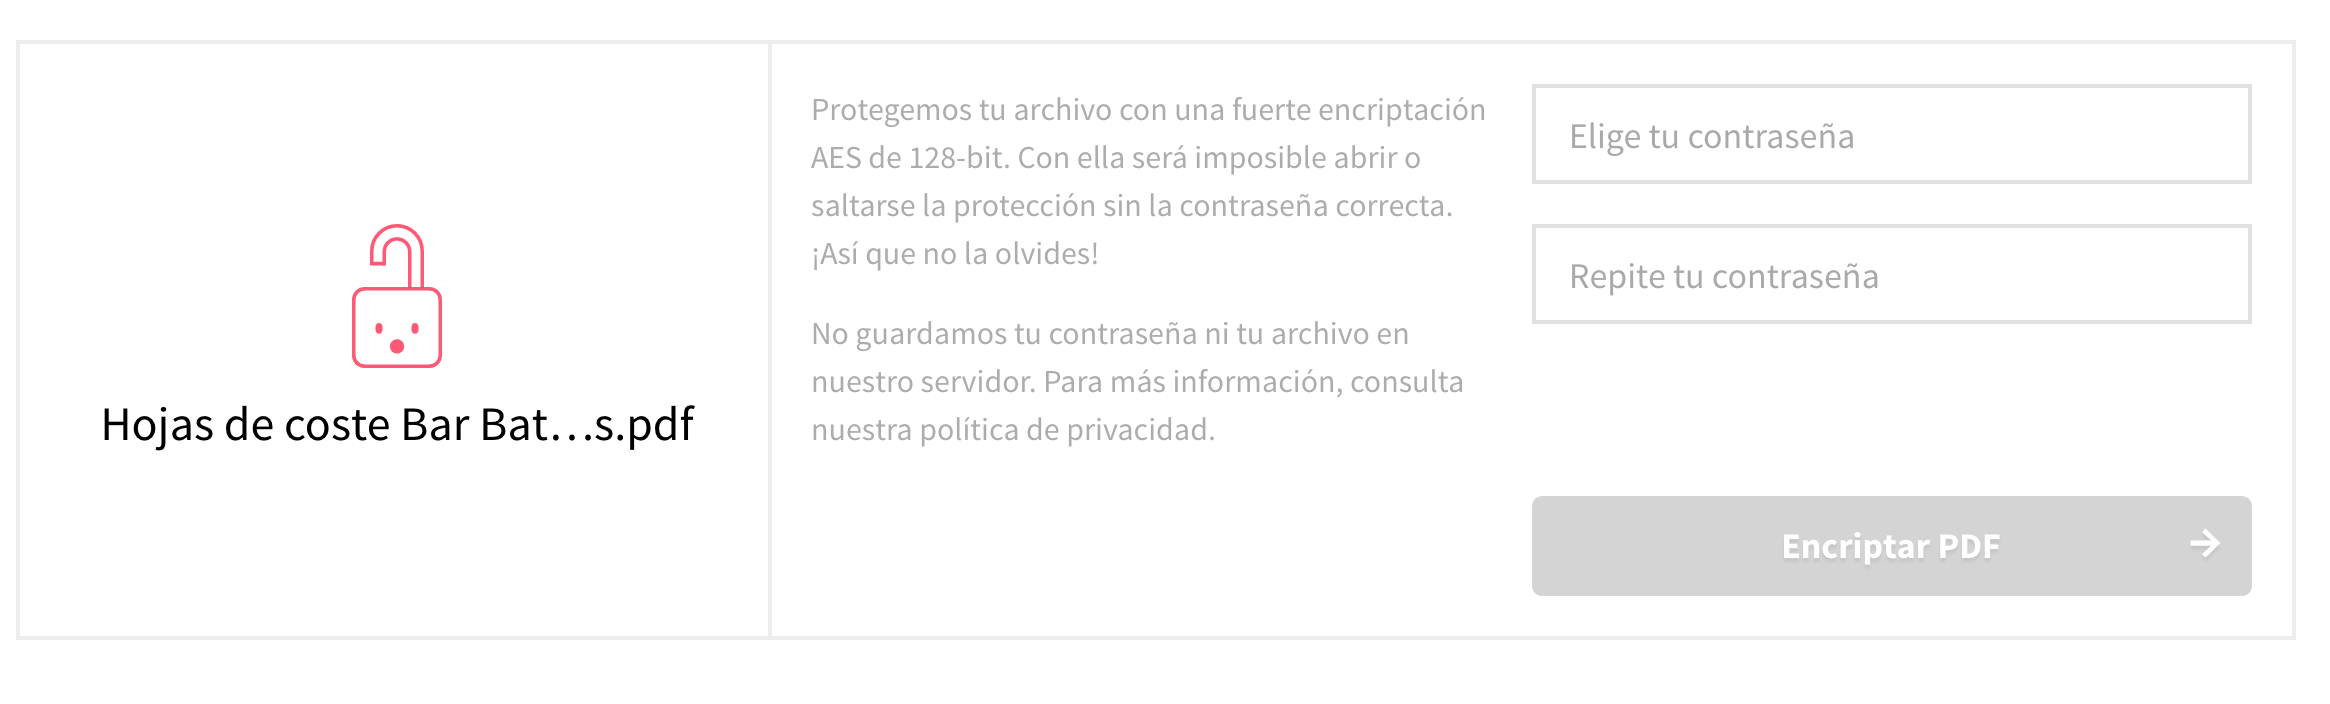 encriptar-pdf